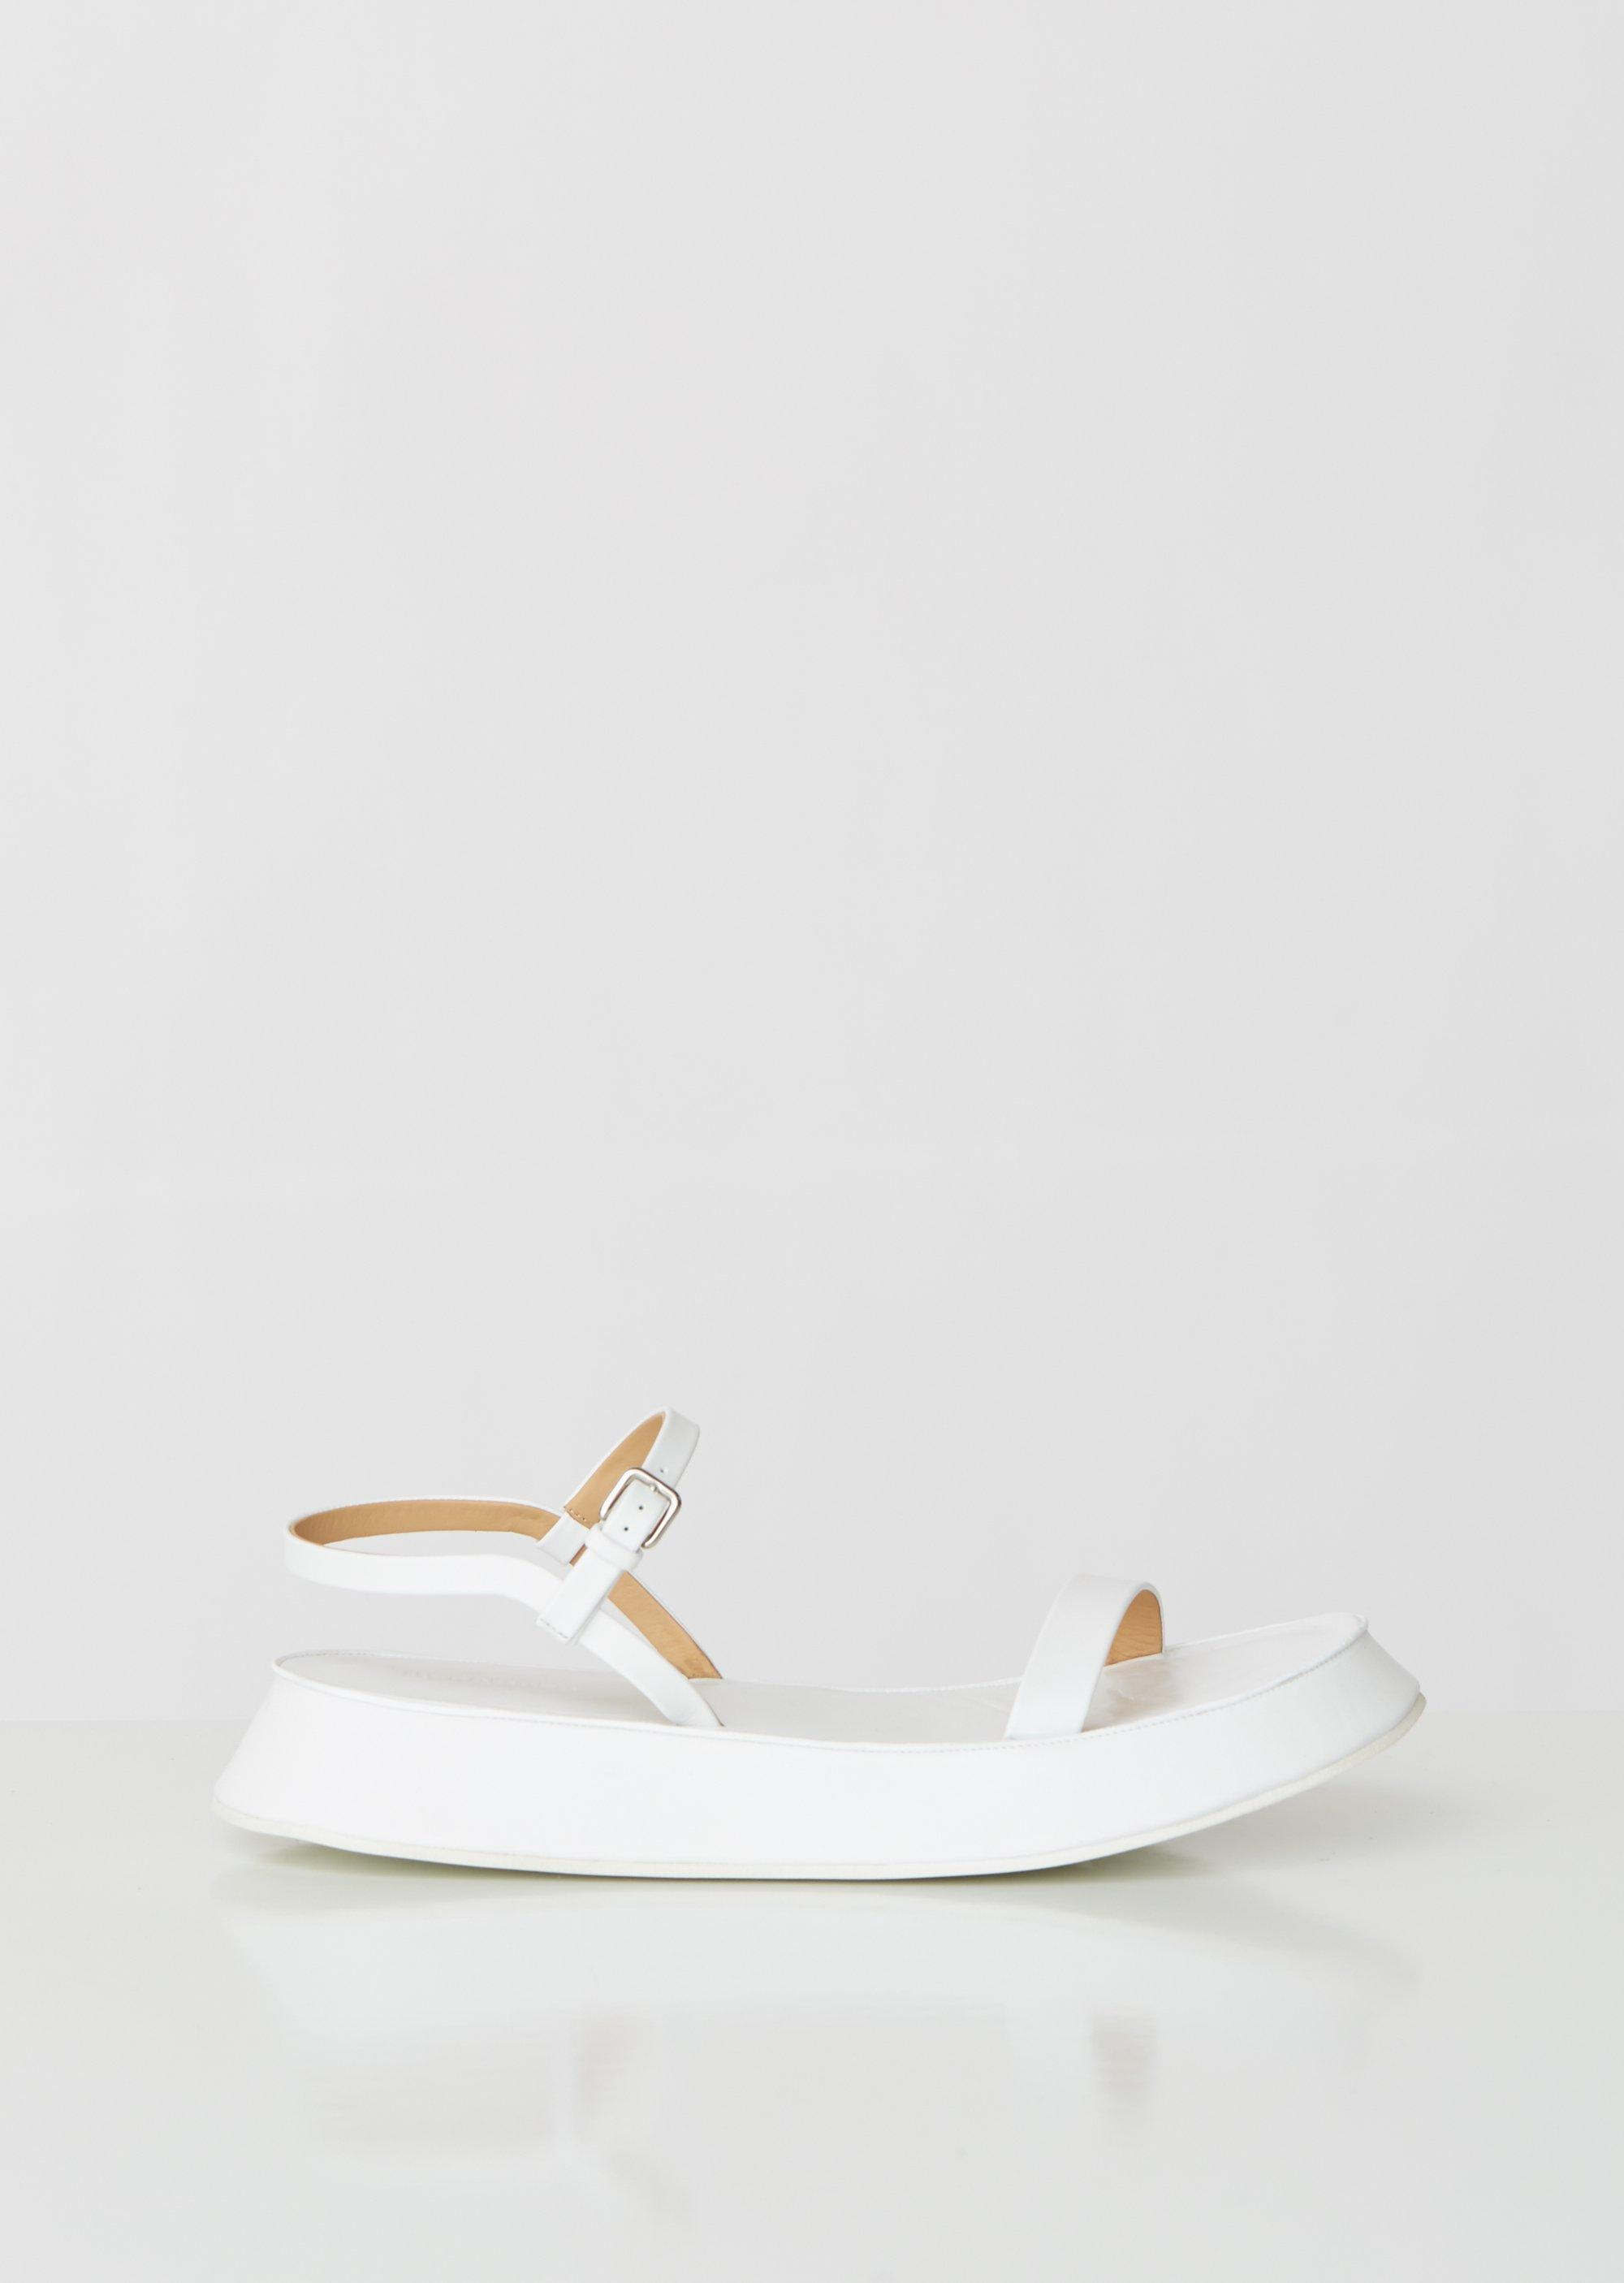 2d685141c2 Jil Sander Monochrome Platform Leather Sandals in White - Lyst